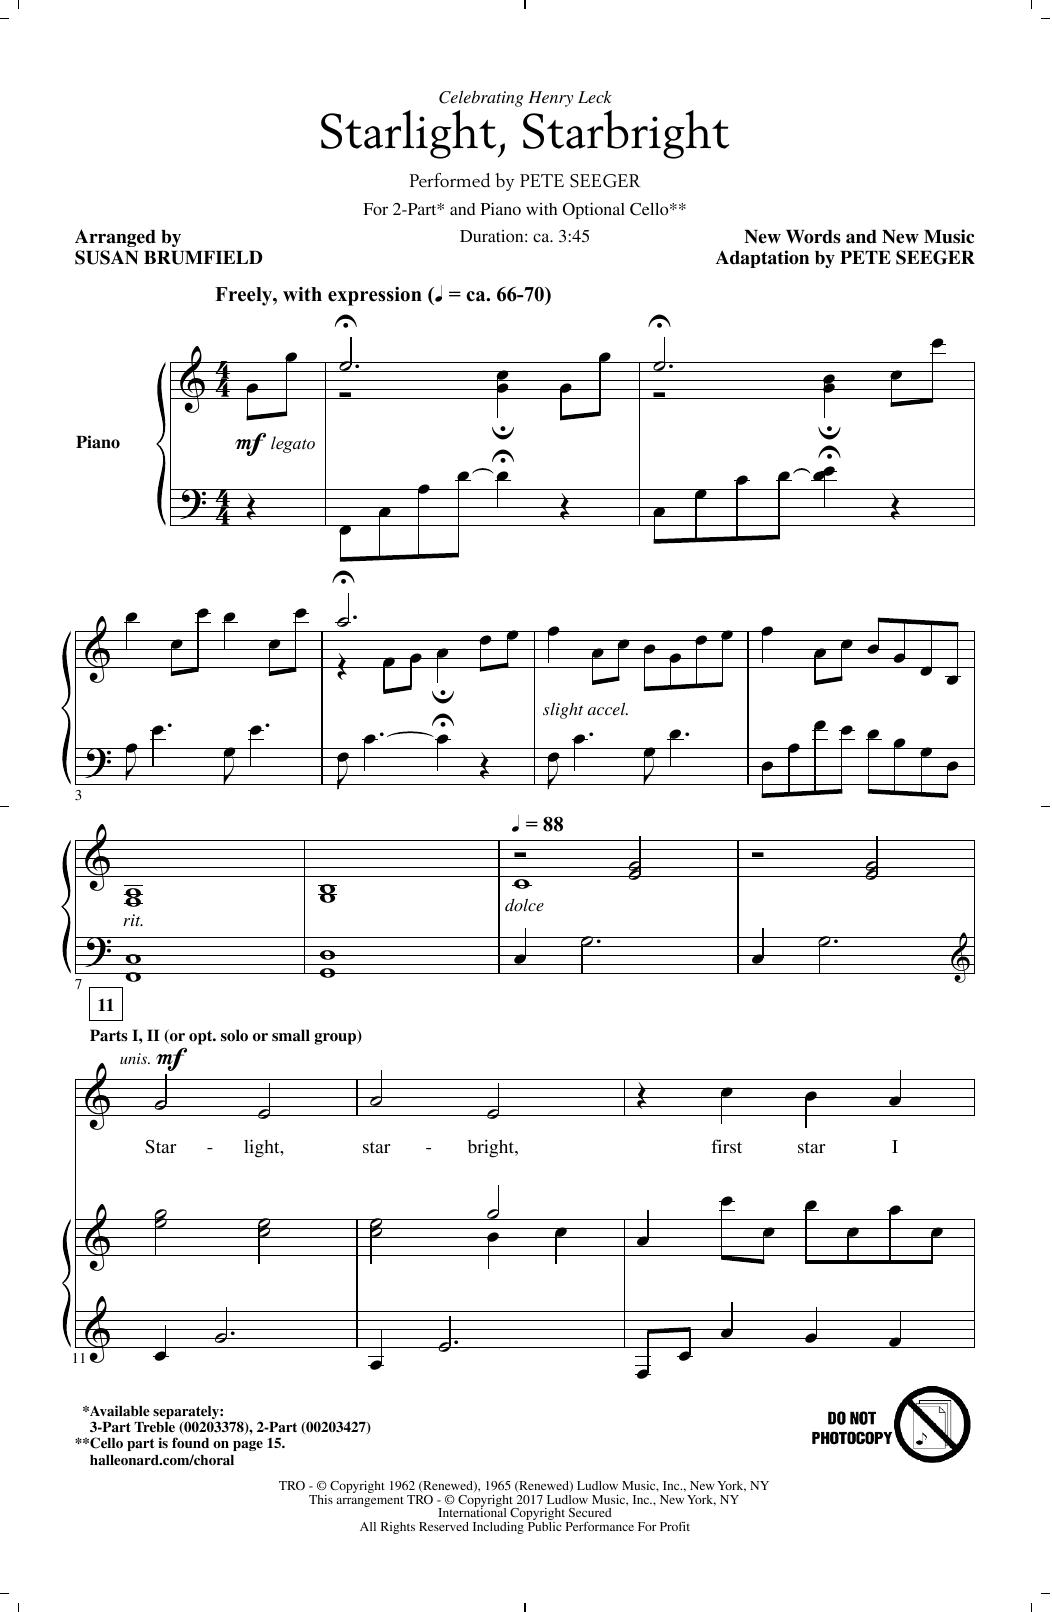 Starlight, Starbright (arr. Susan Brumfield) (2-Part Choir)